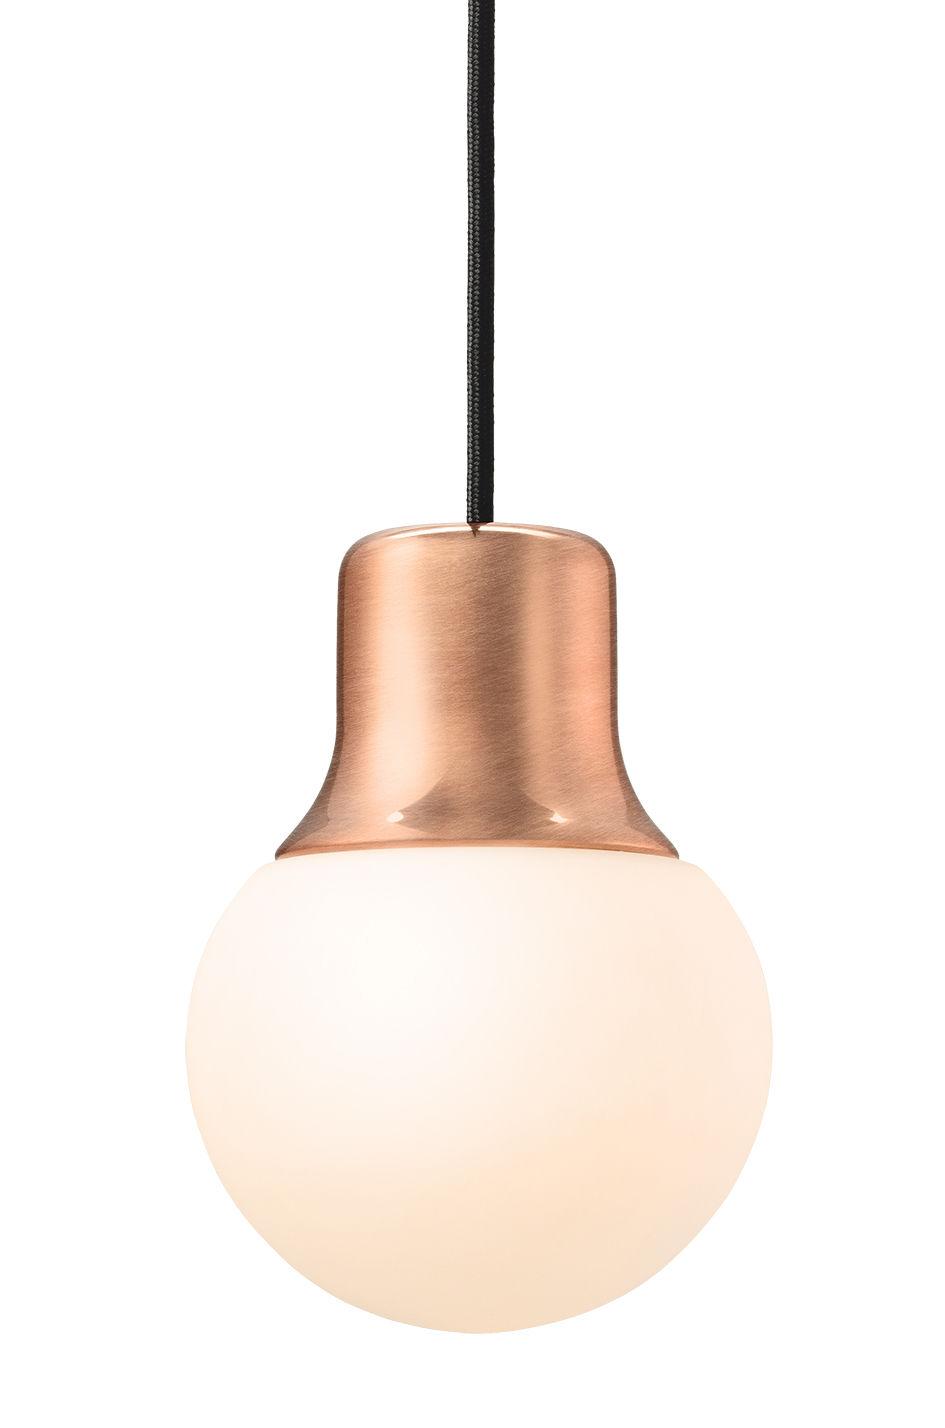 Luminaire - Suspensions - Suspension Mass Light - &tradition - Cuivre - Cuivre laqué